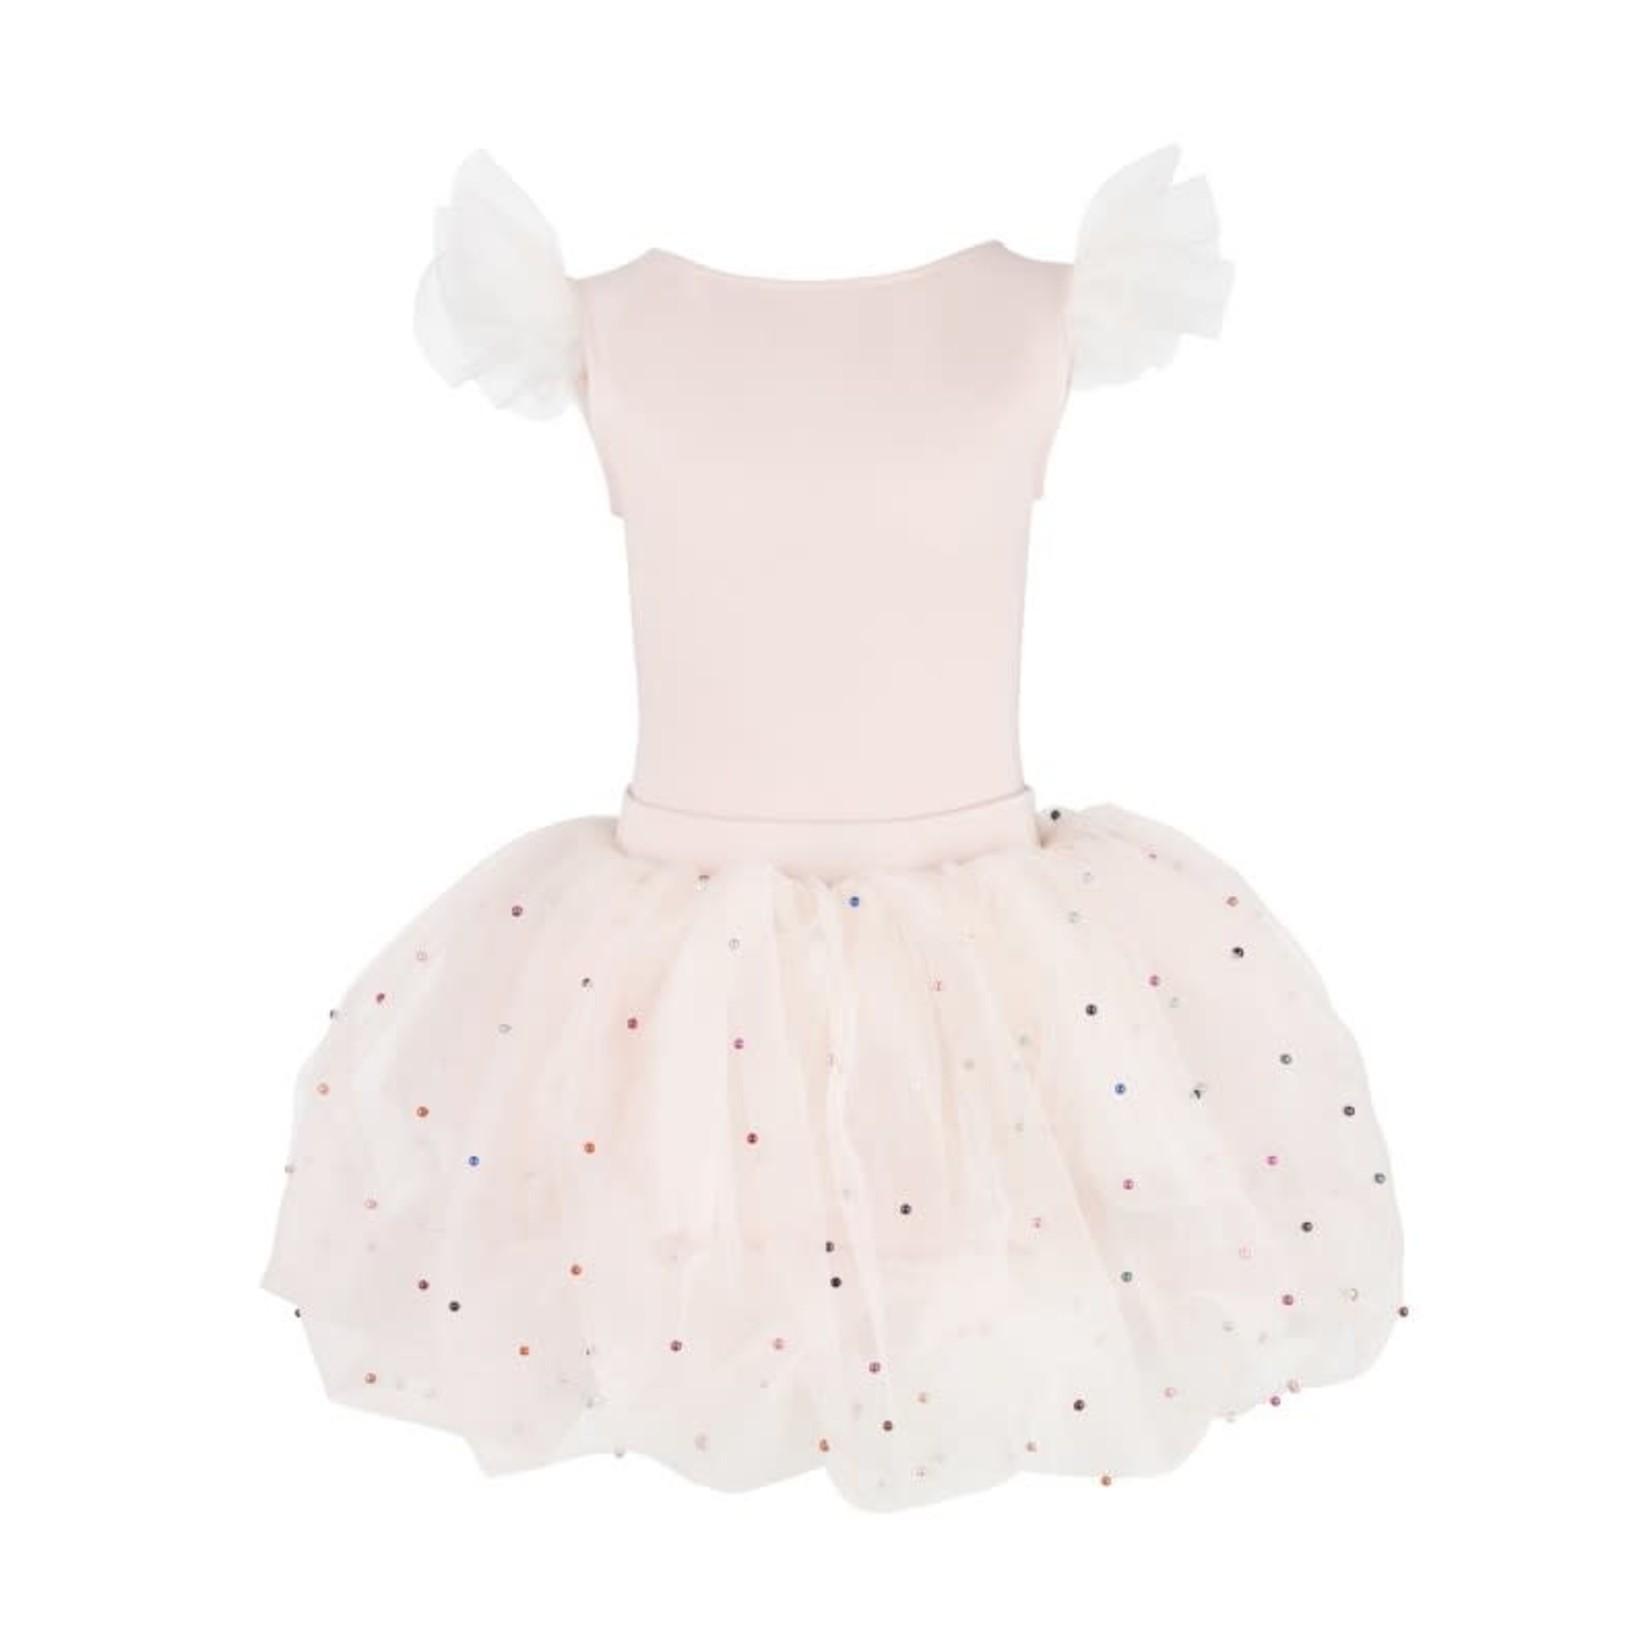 Cotton & Sweets Ballerina Set